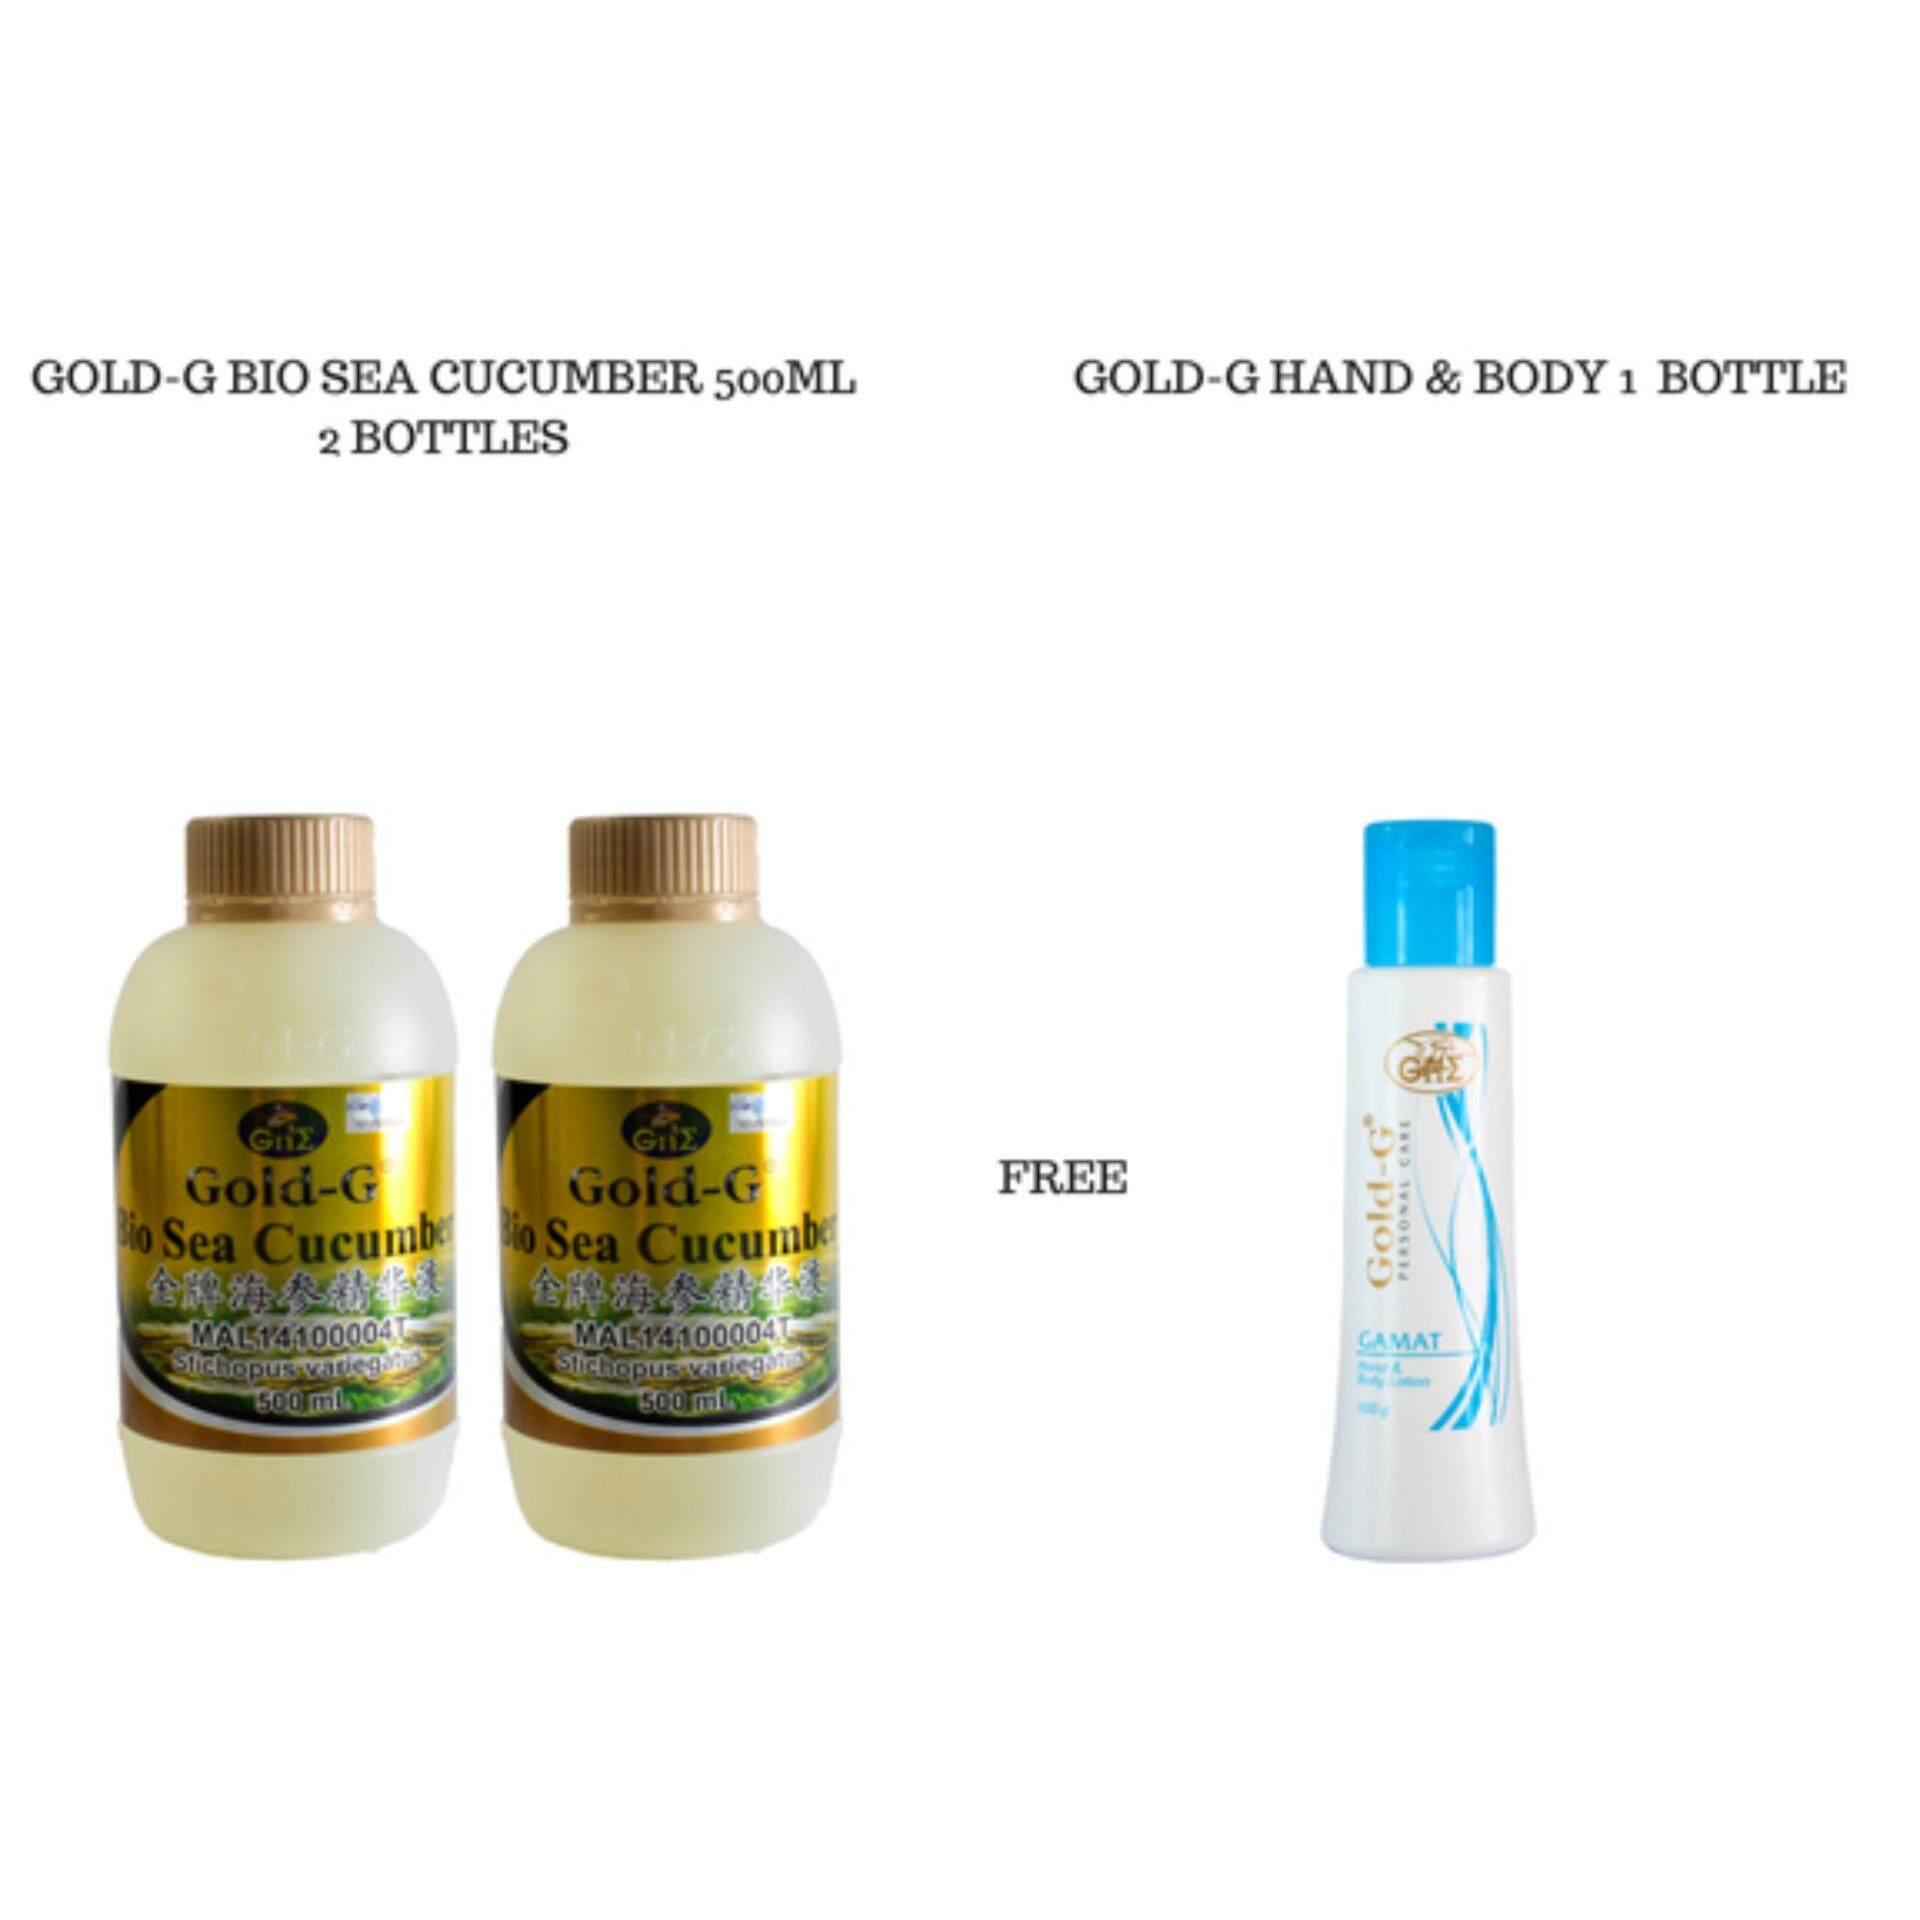 Gold G Buy At Best Price In Malaysia Gamat 500 Ml Bio Sea Cucumber 2 Btls Free Hand